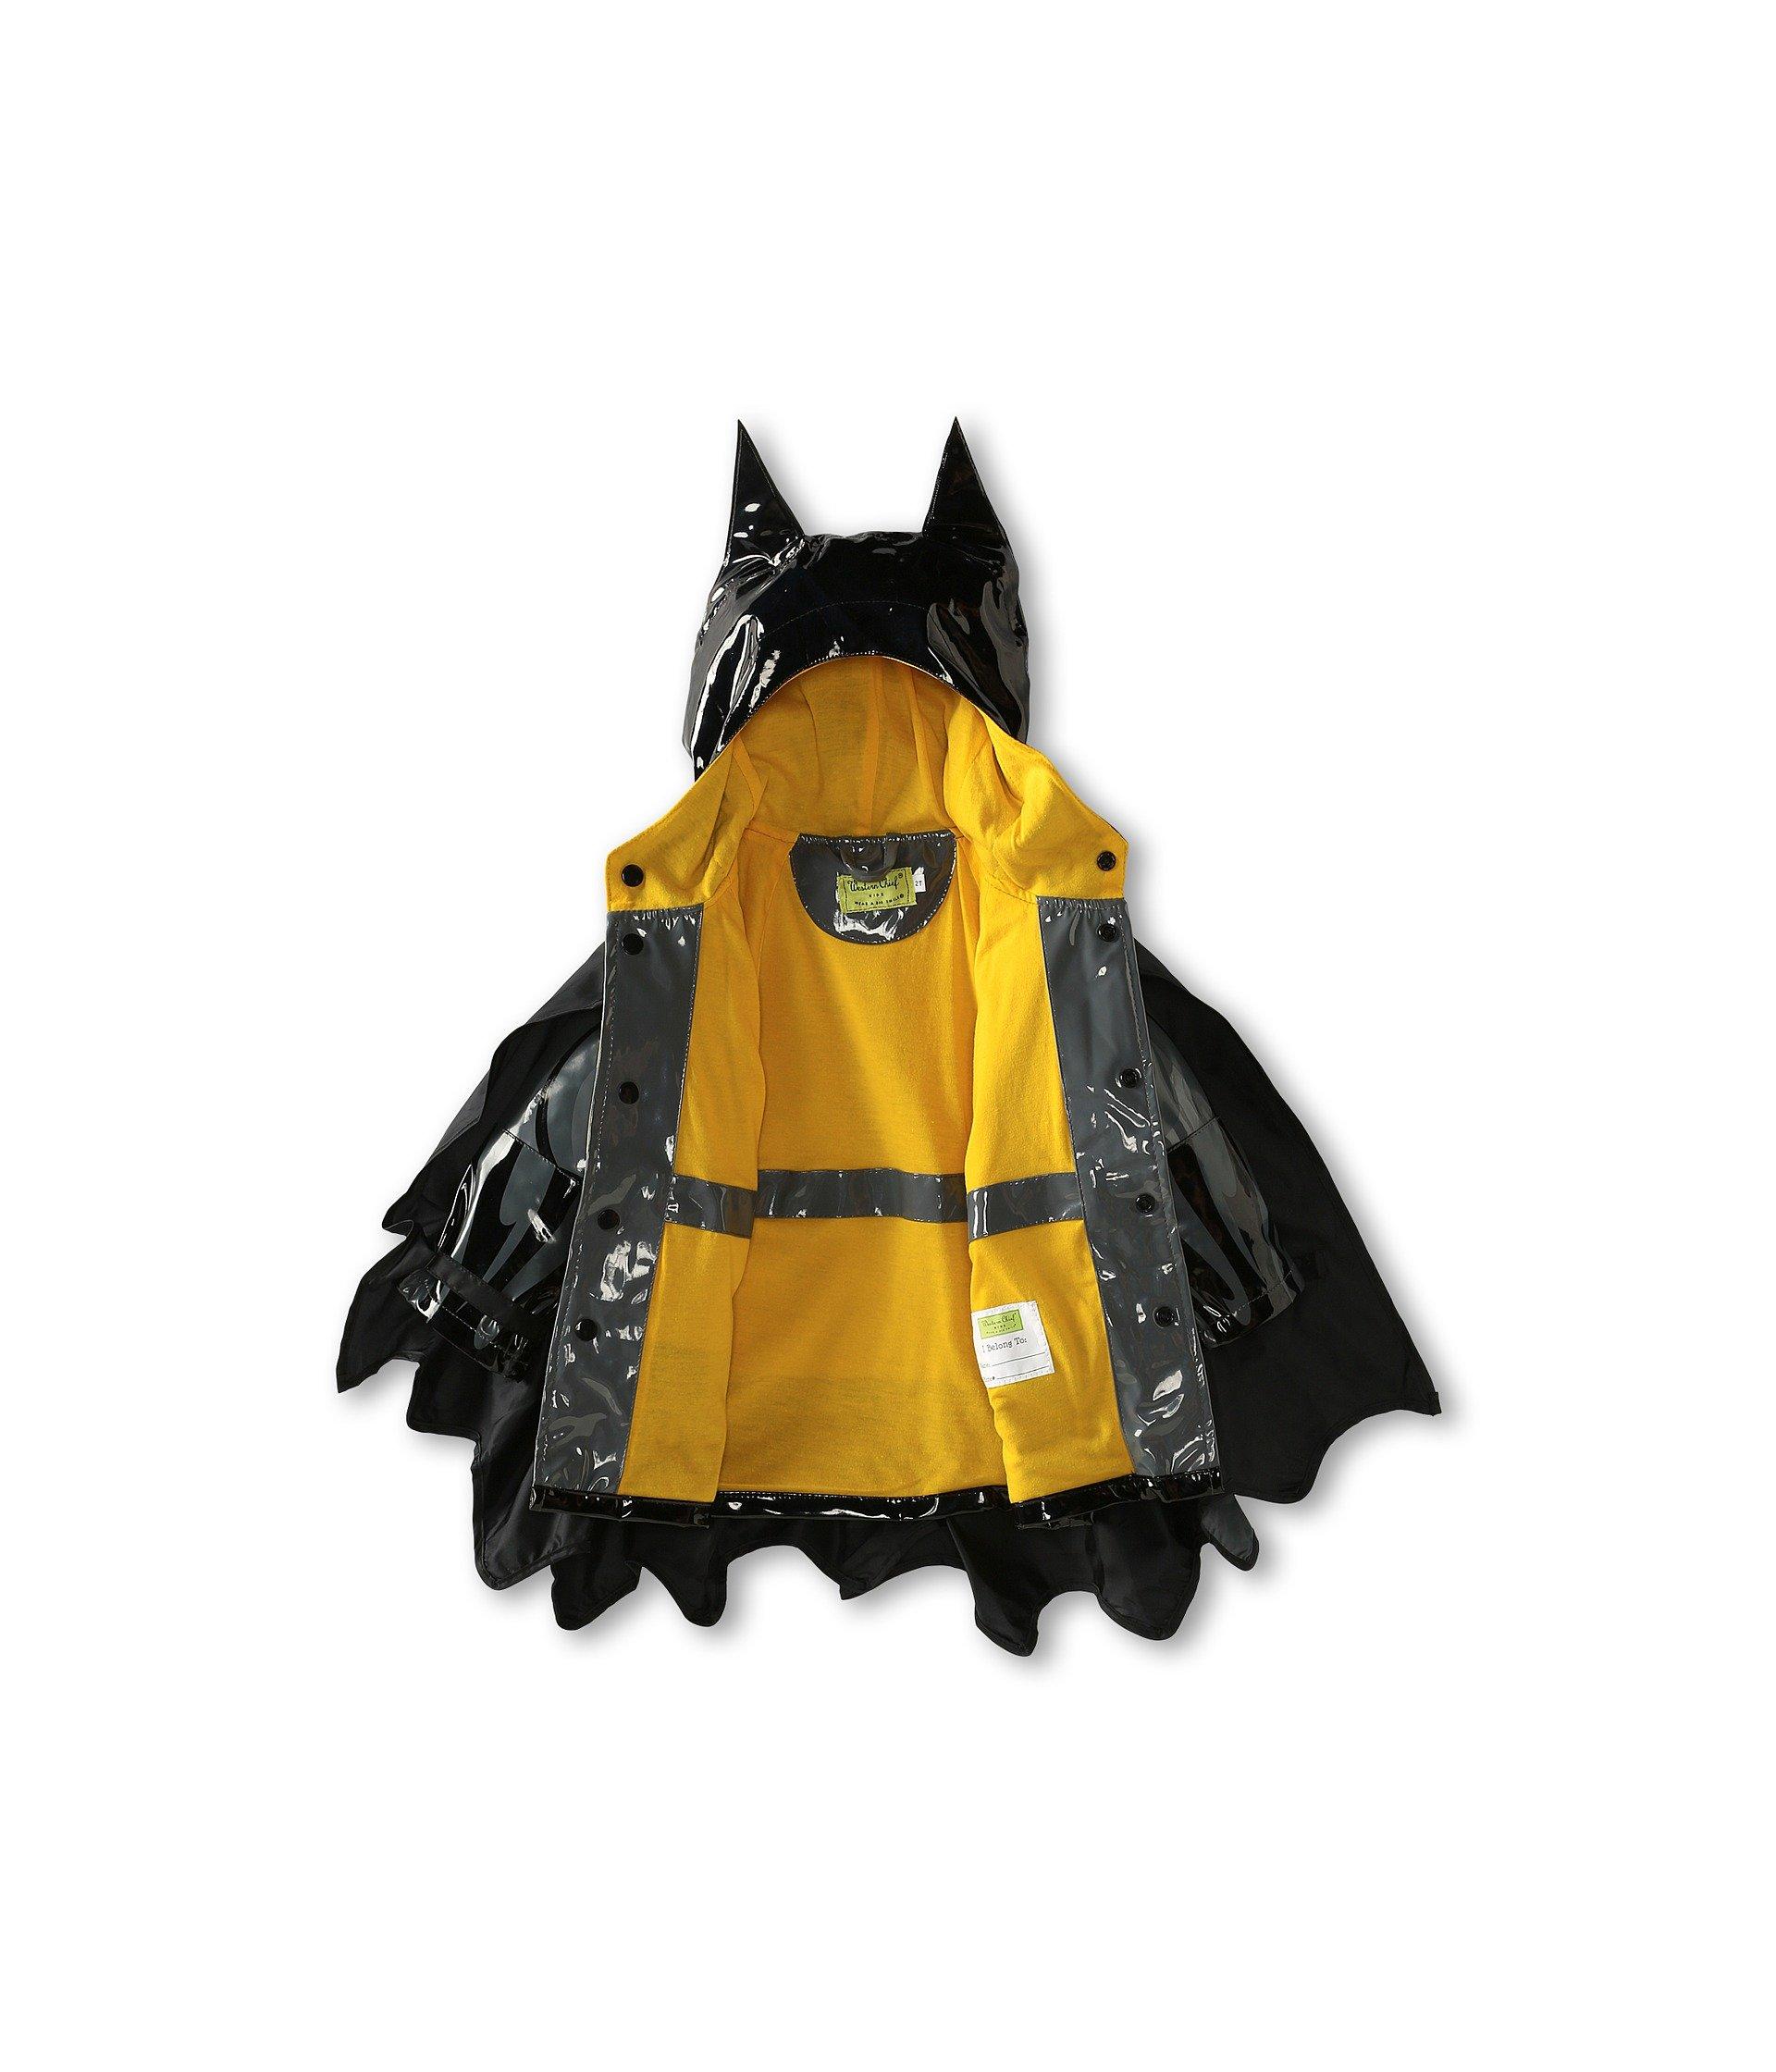 Western Chief Little Boys' Batman Everlasting Rain Coat, Black, 5/6 by Western Chief (Image #4)